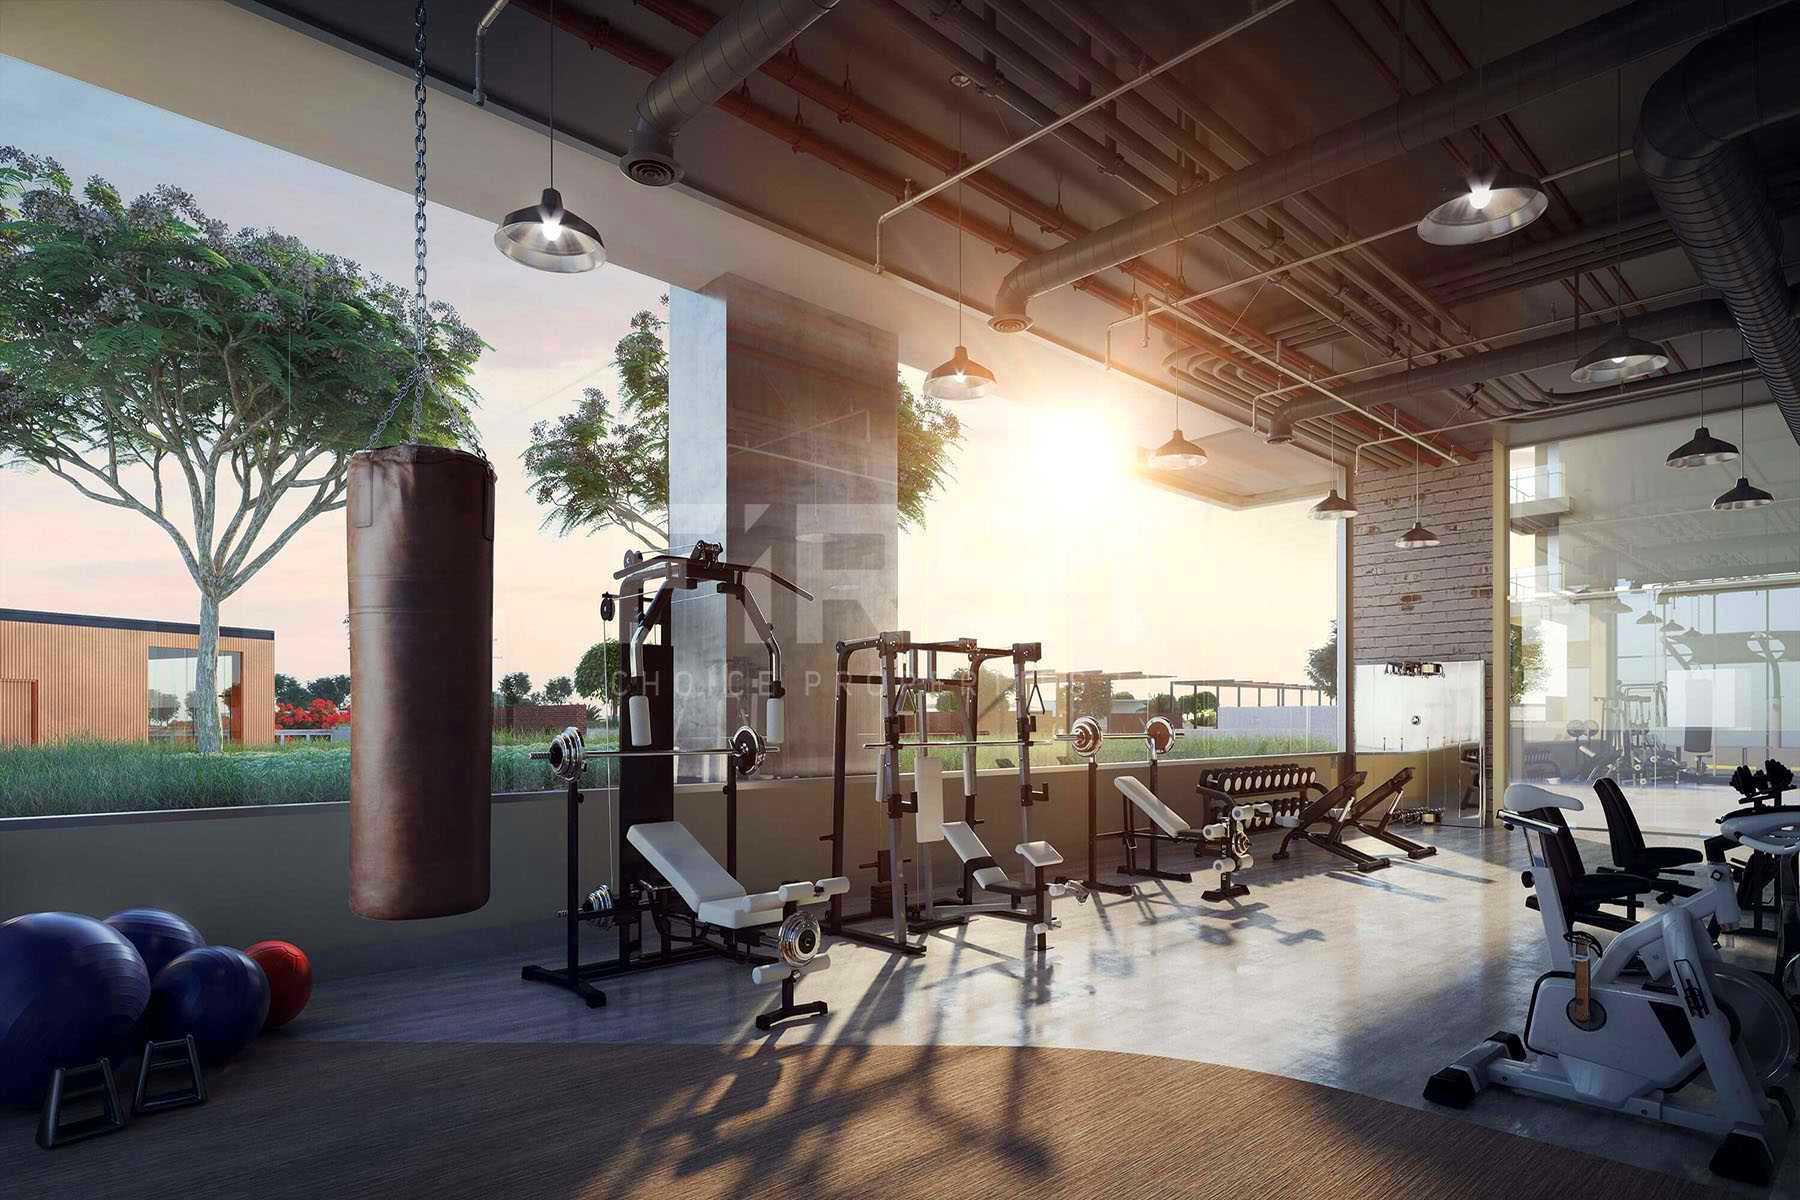 Studio,1 Bedroom, 2 Bedroom, 3 Bedroom,Apartment in The Bridges,Shams Abu Dhabi,Al Reem Island- Abu Dhabi-UAE (5).jpg